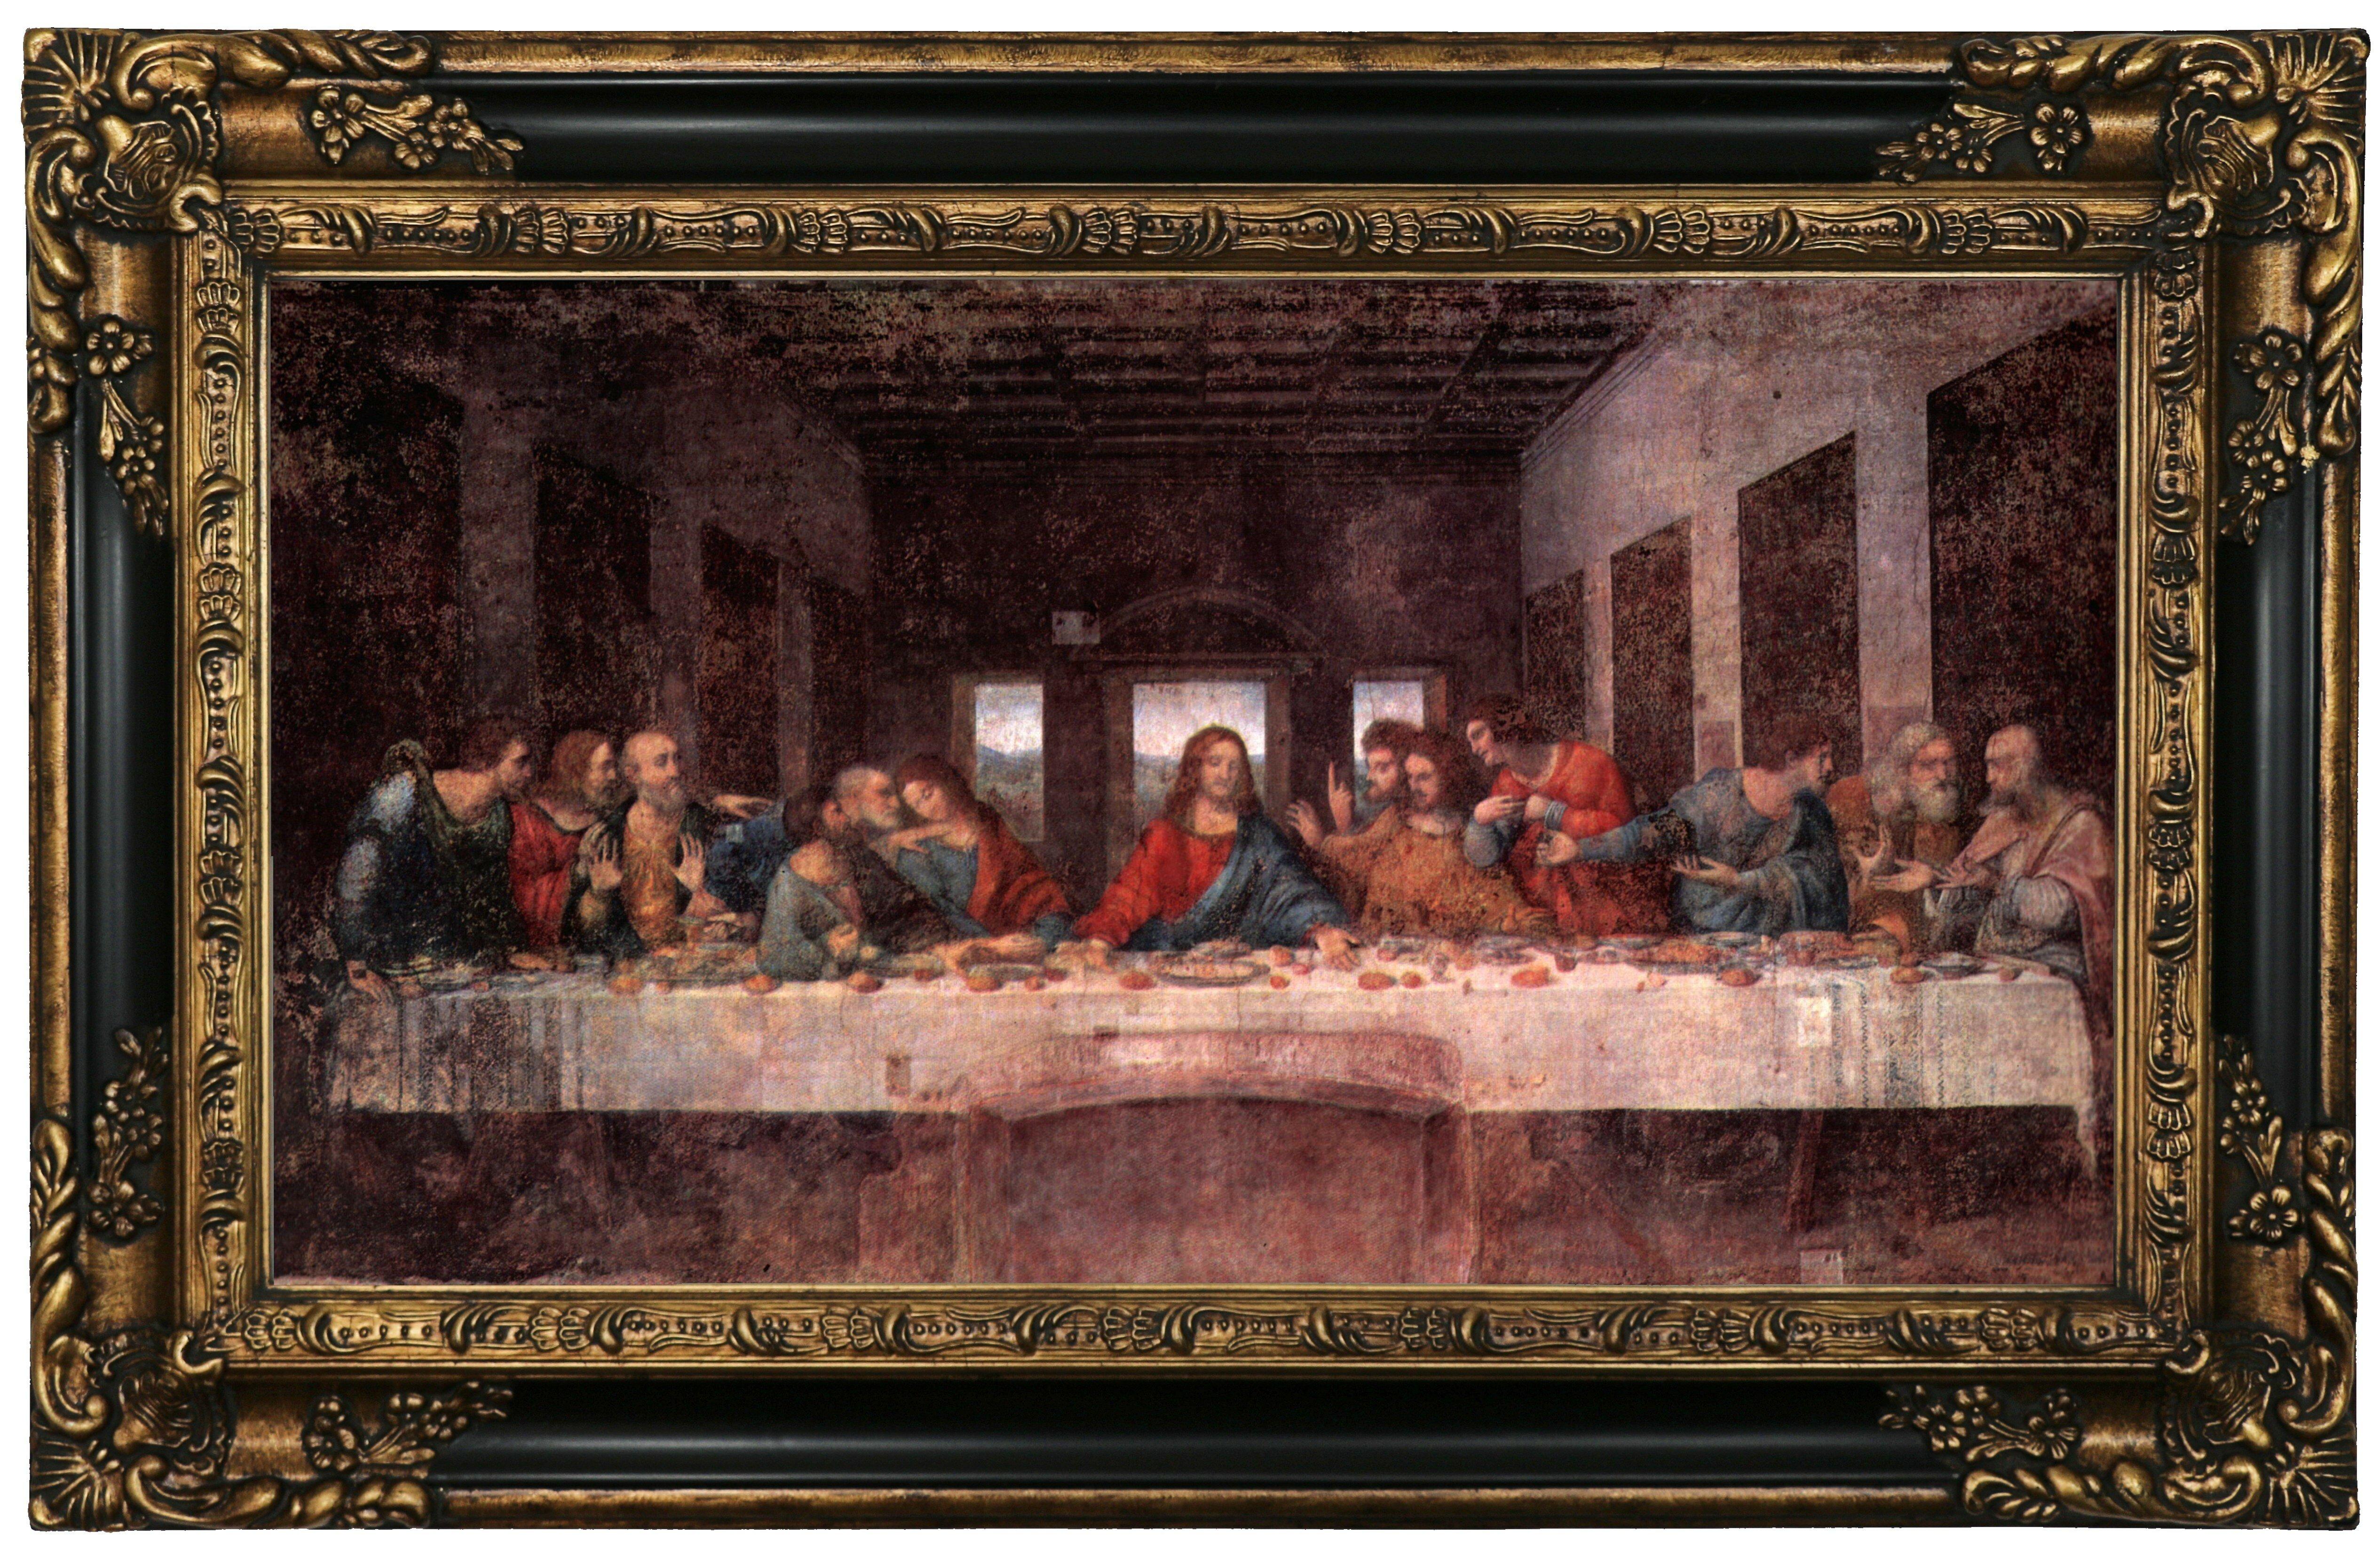 THE LAST SUPPER JESUS CHRIST BY LEONARDO DA VINCI PAINTING REAL CANVASART PRINT